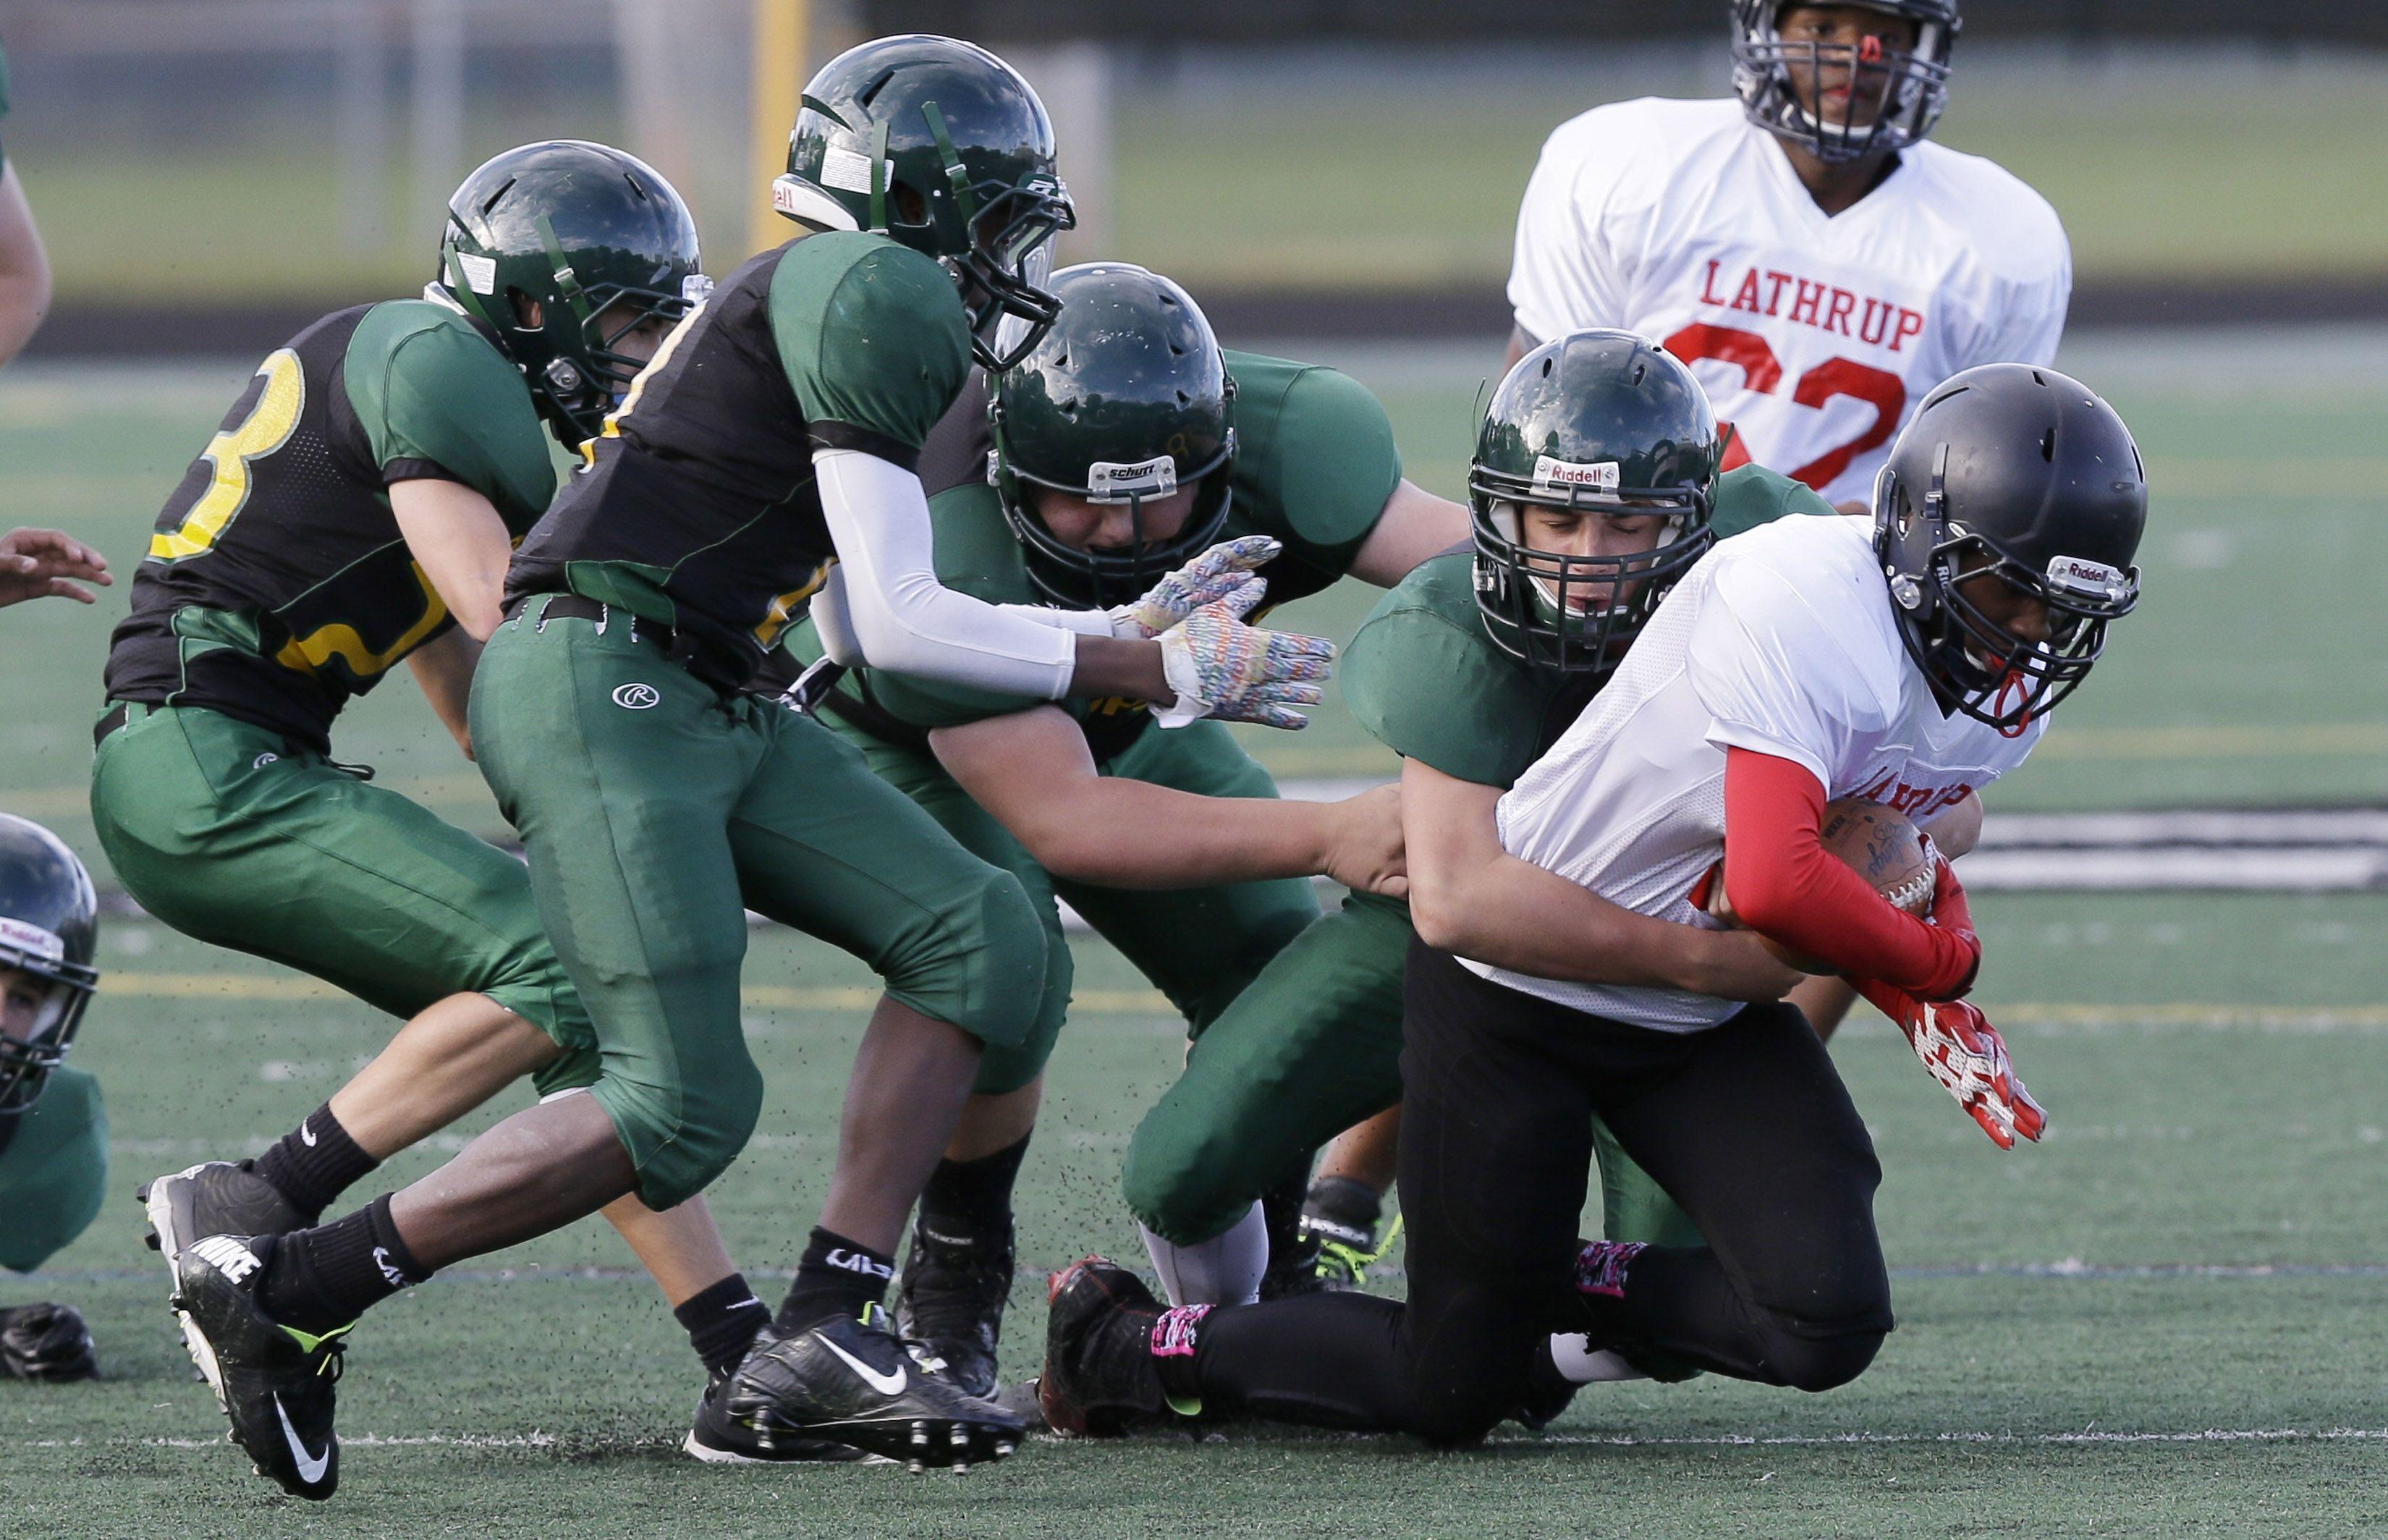 Newsela Concussion program for high school athletes